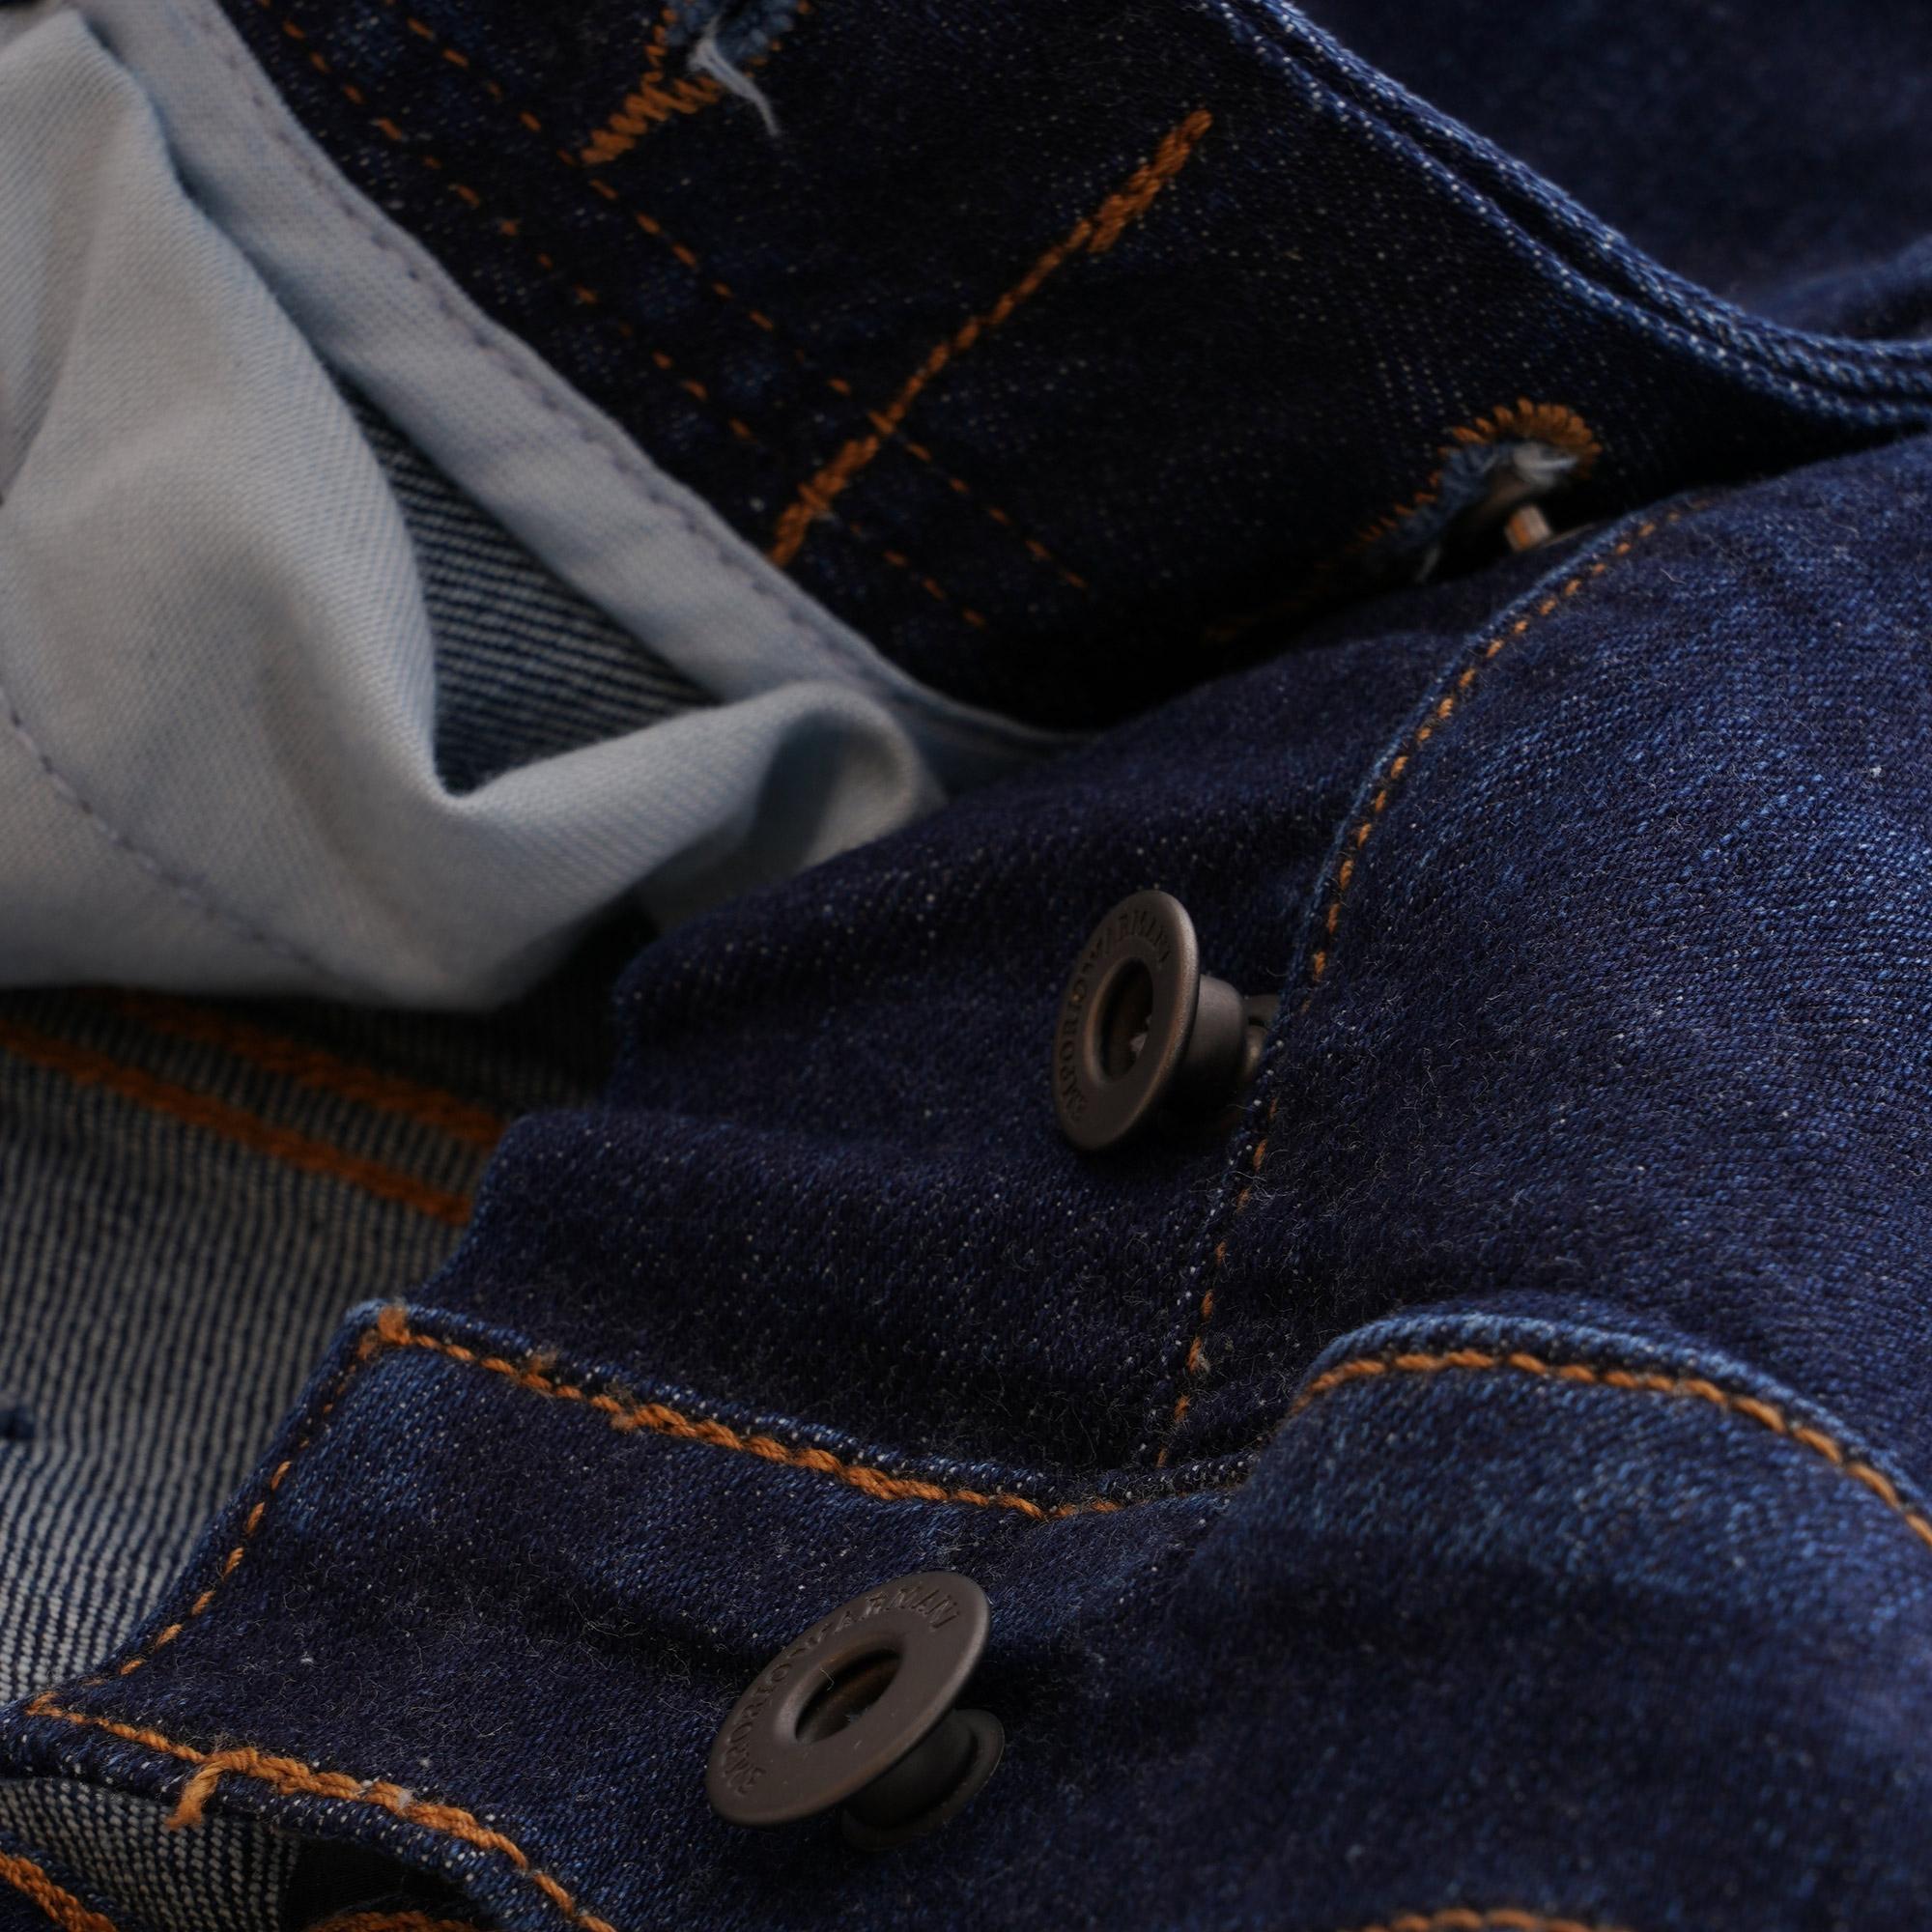 bb0b11a0890e Emporio Armani - Blue J21 Regular Fit Stretch Denim Jeans for Men - Lyst.  View fullscreen